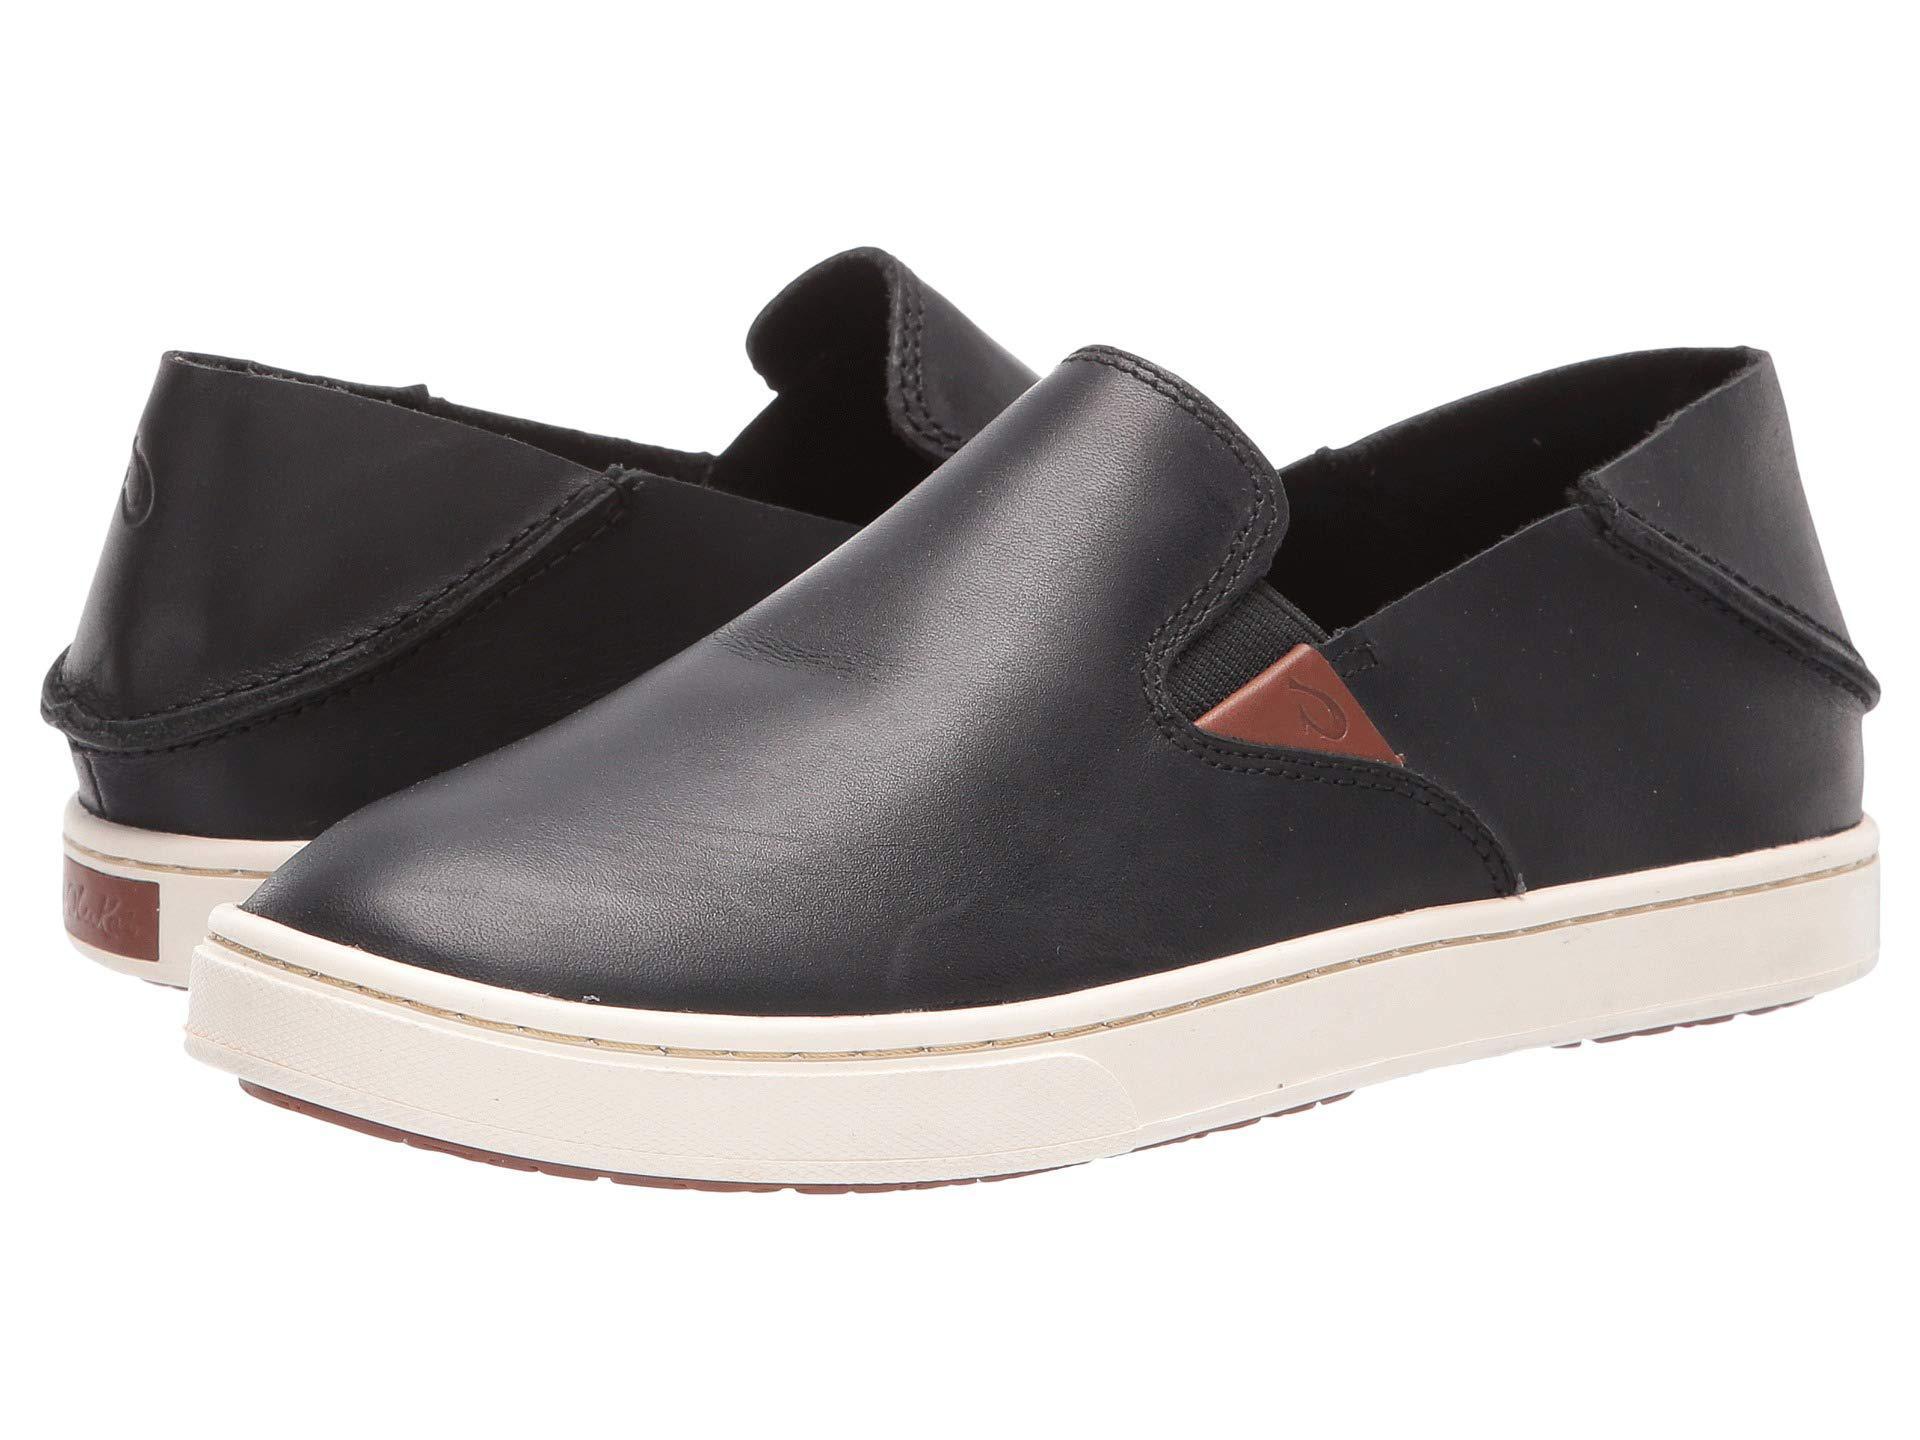 Lyst - Olukai Pehuea Leather (black Honu black) Women s Shoes in Black 336414894